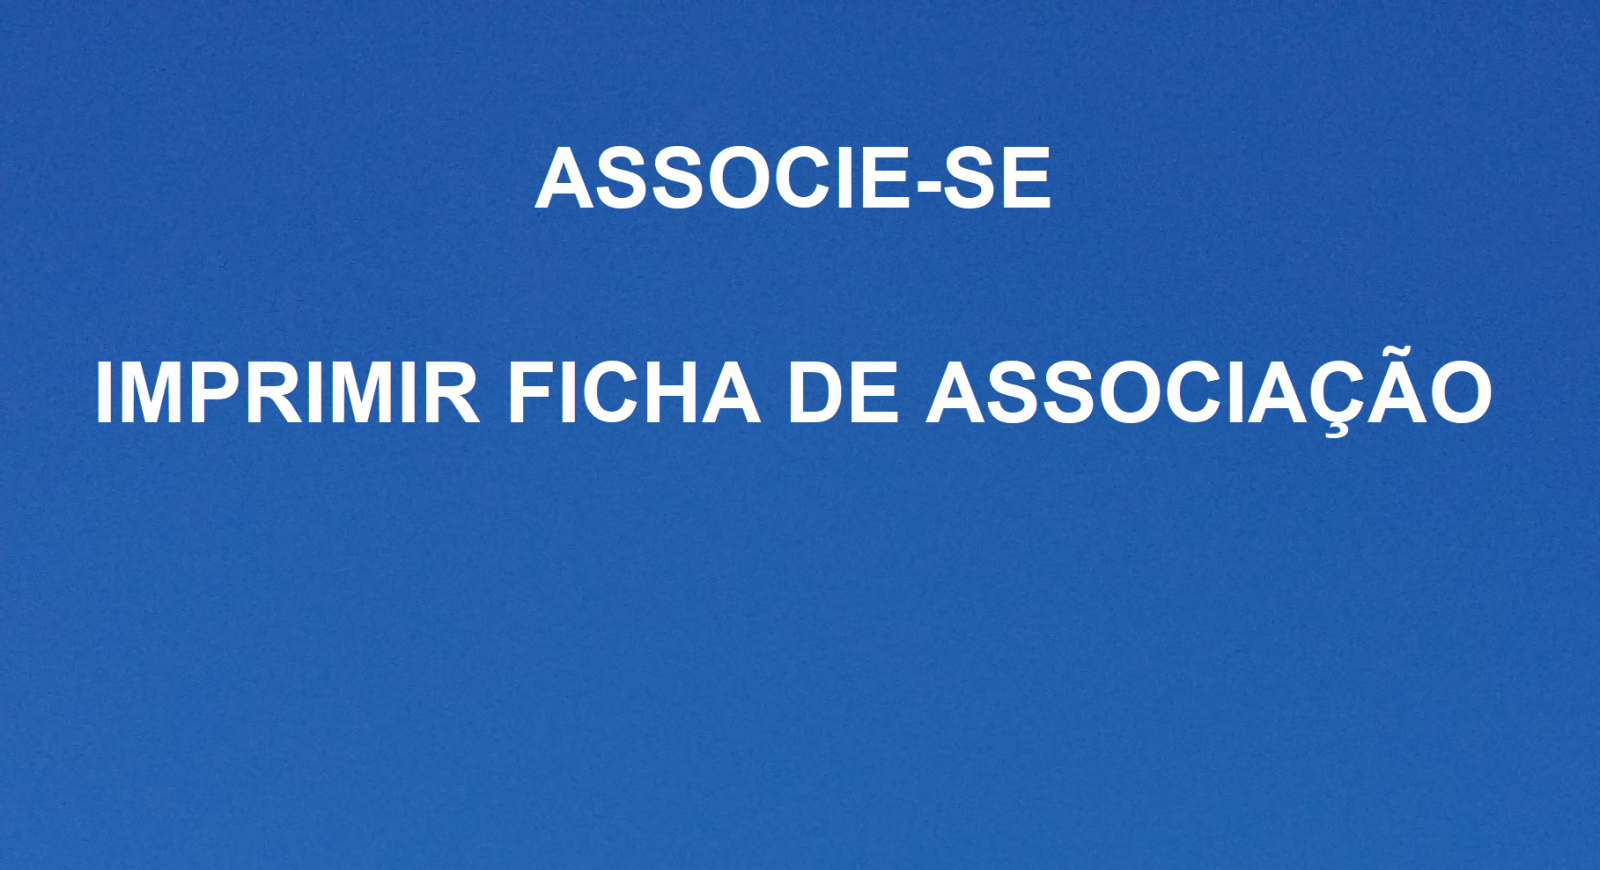 ASSOCIE-SE